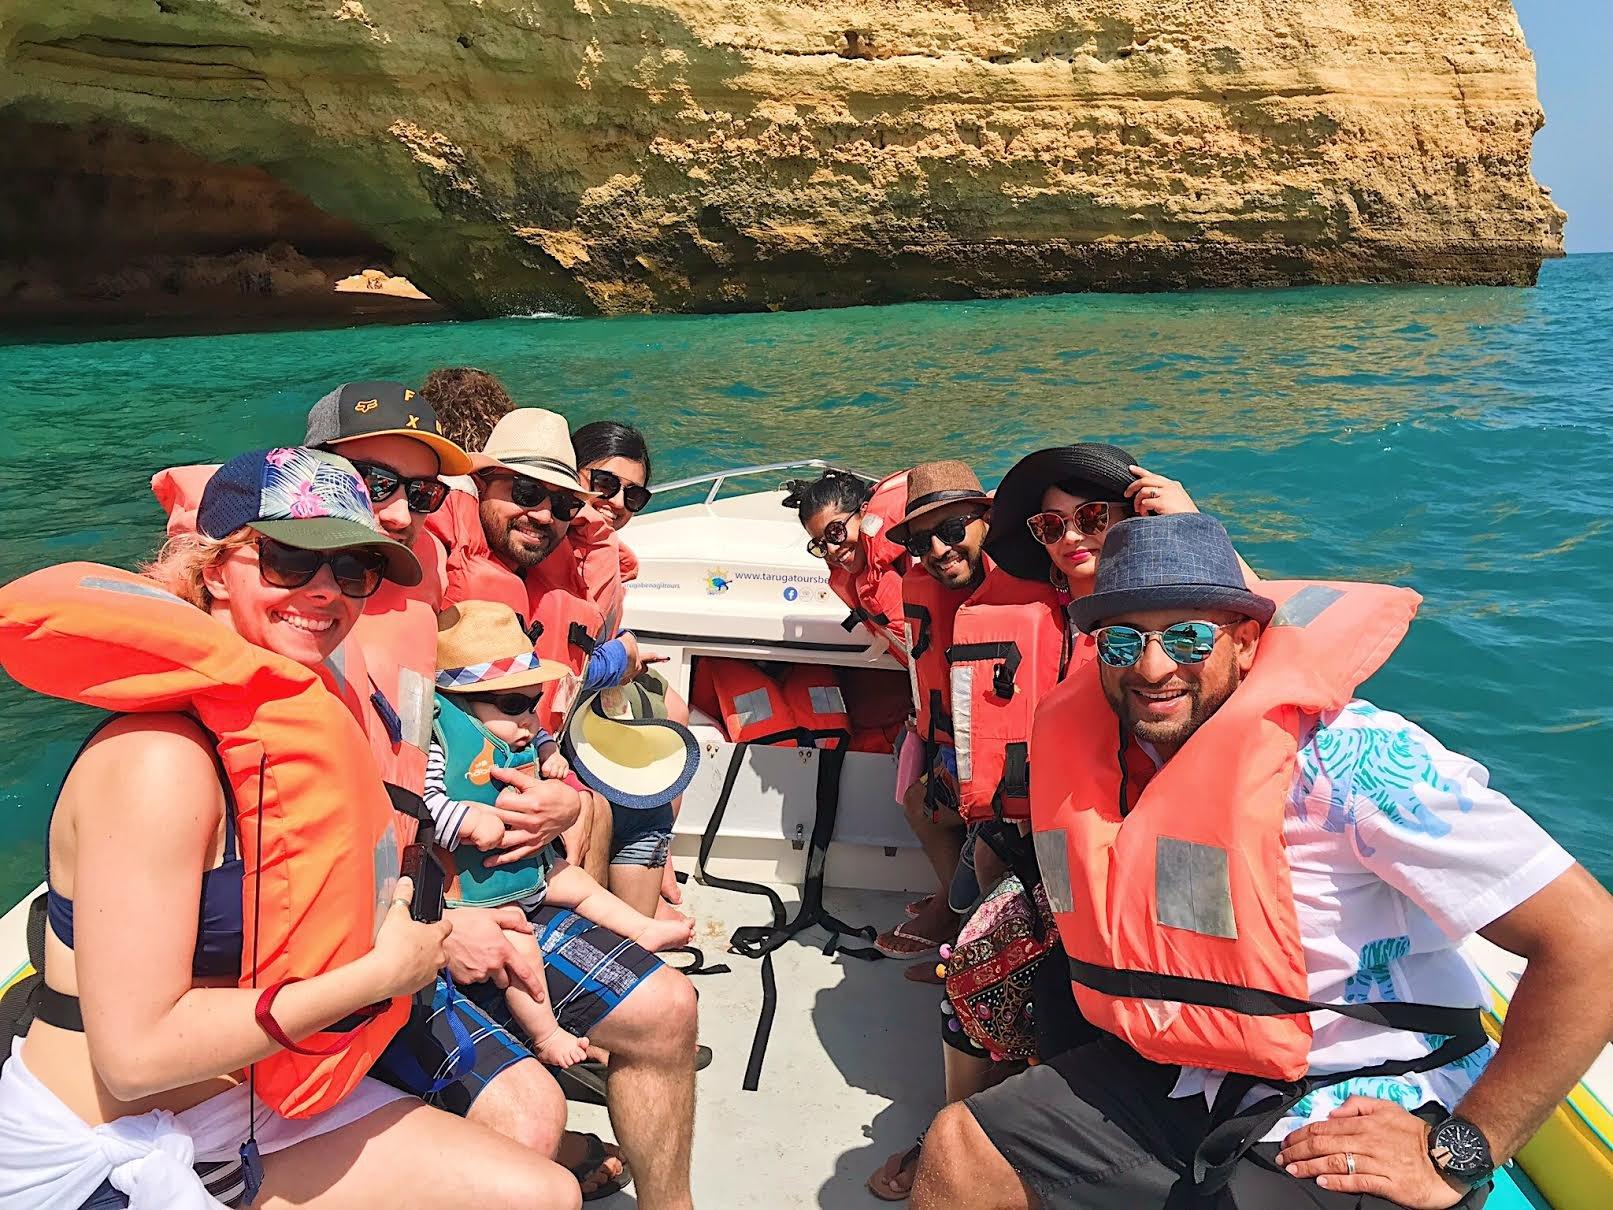 Muslim-travel-recommendations-Algarve-Portugal-Benagil-cave-boat-tour